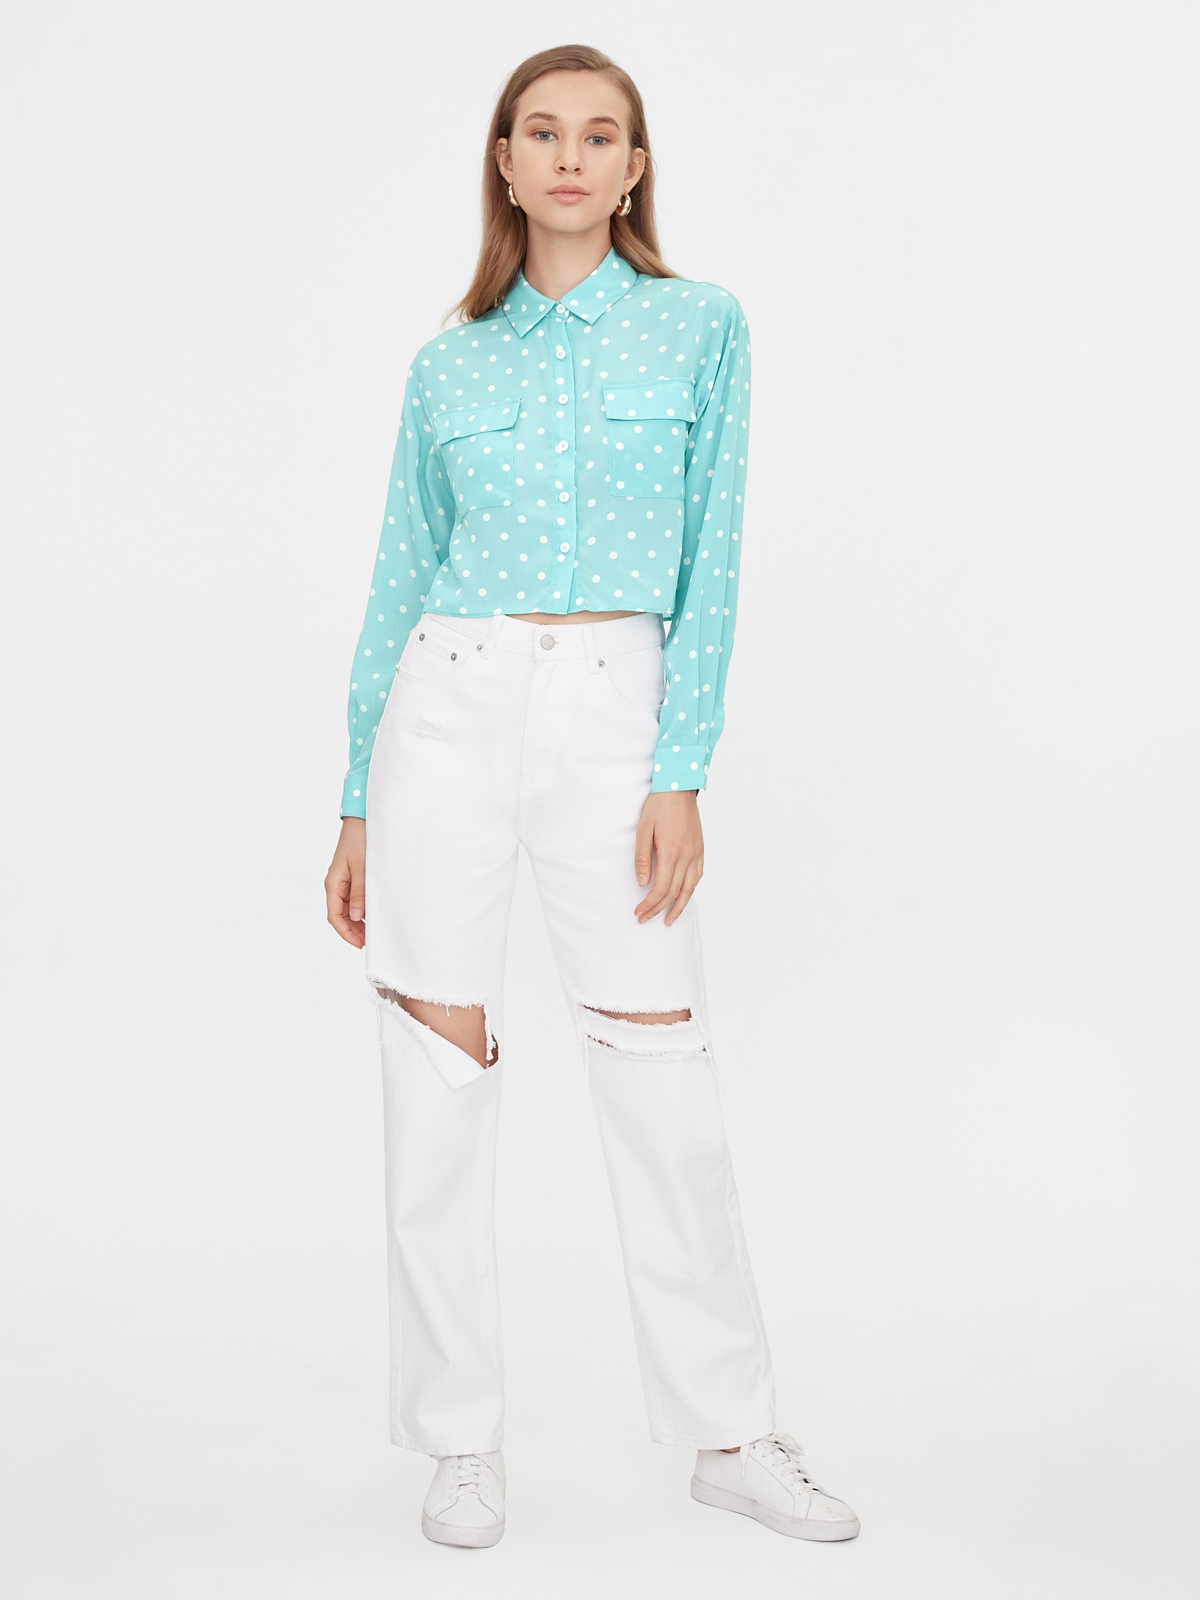 Polka Dot Double Pockets Shirt Blue